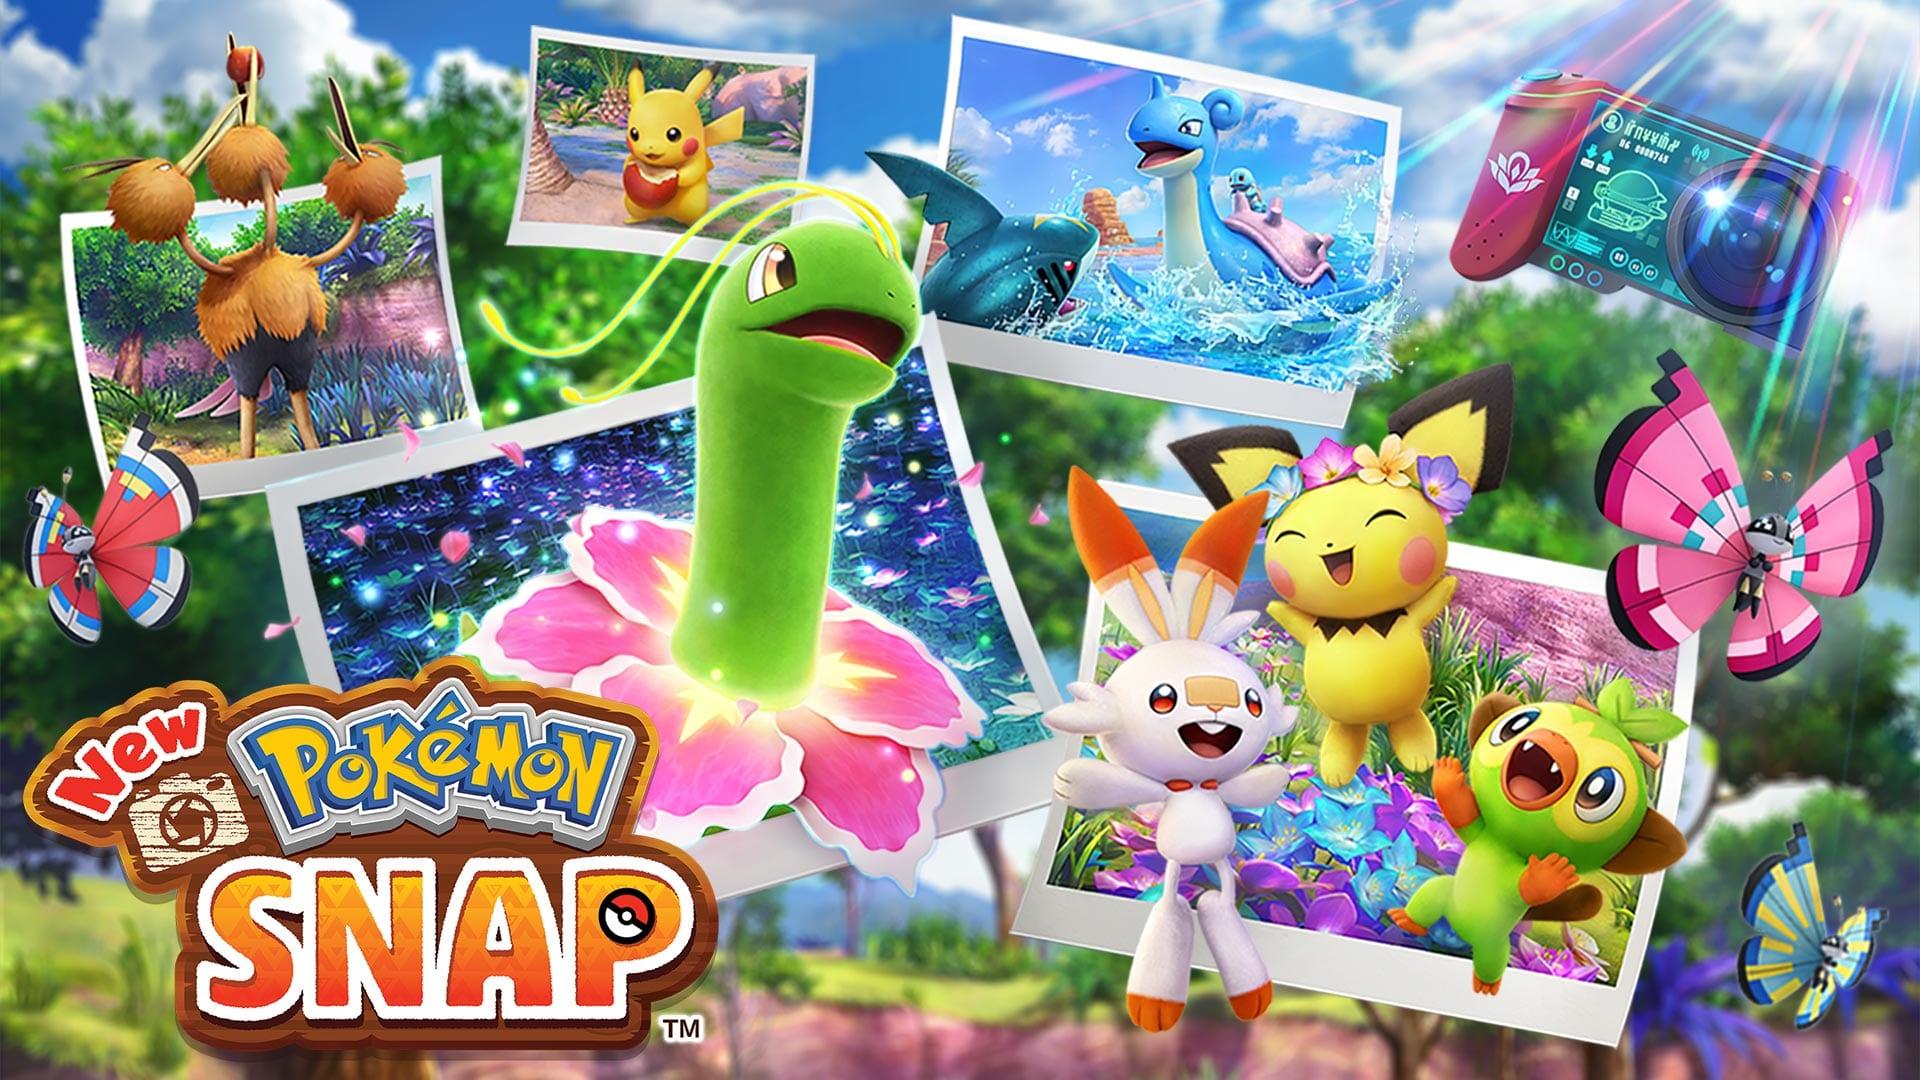 founja jungle night, new pokemon snap, how to unlock